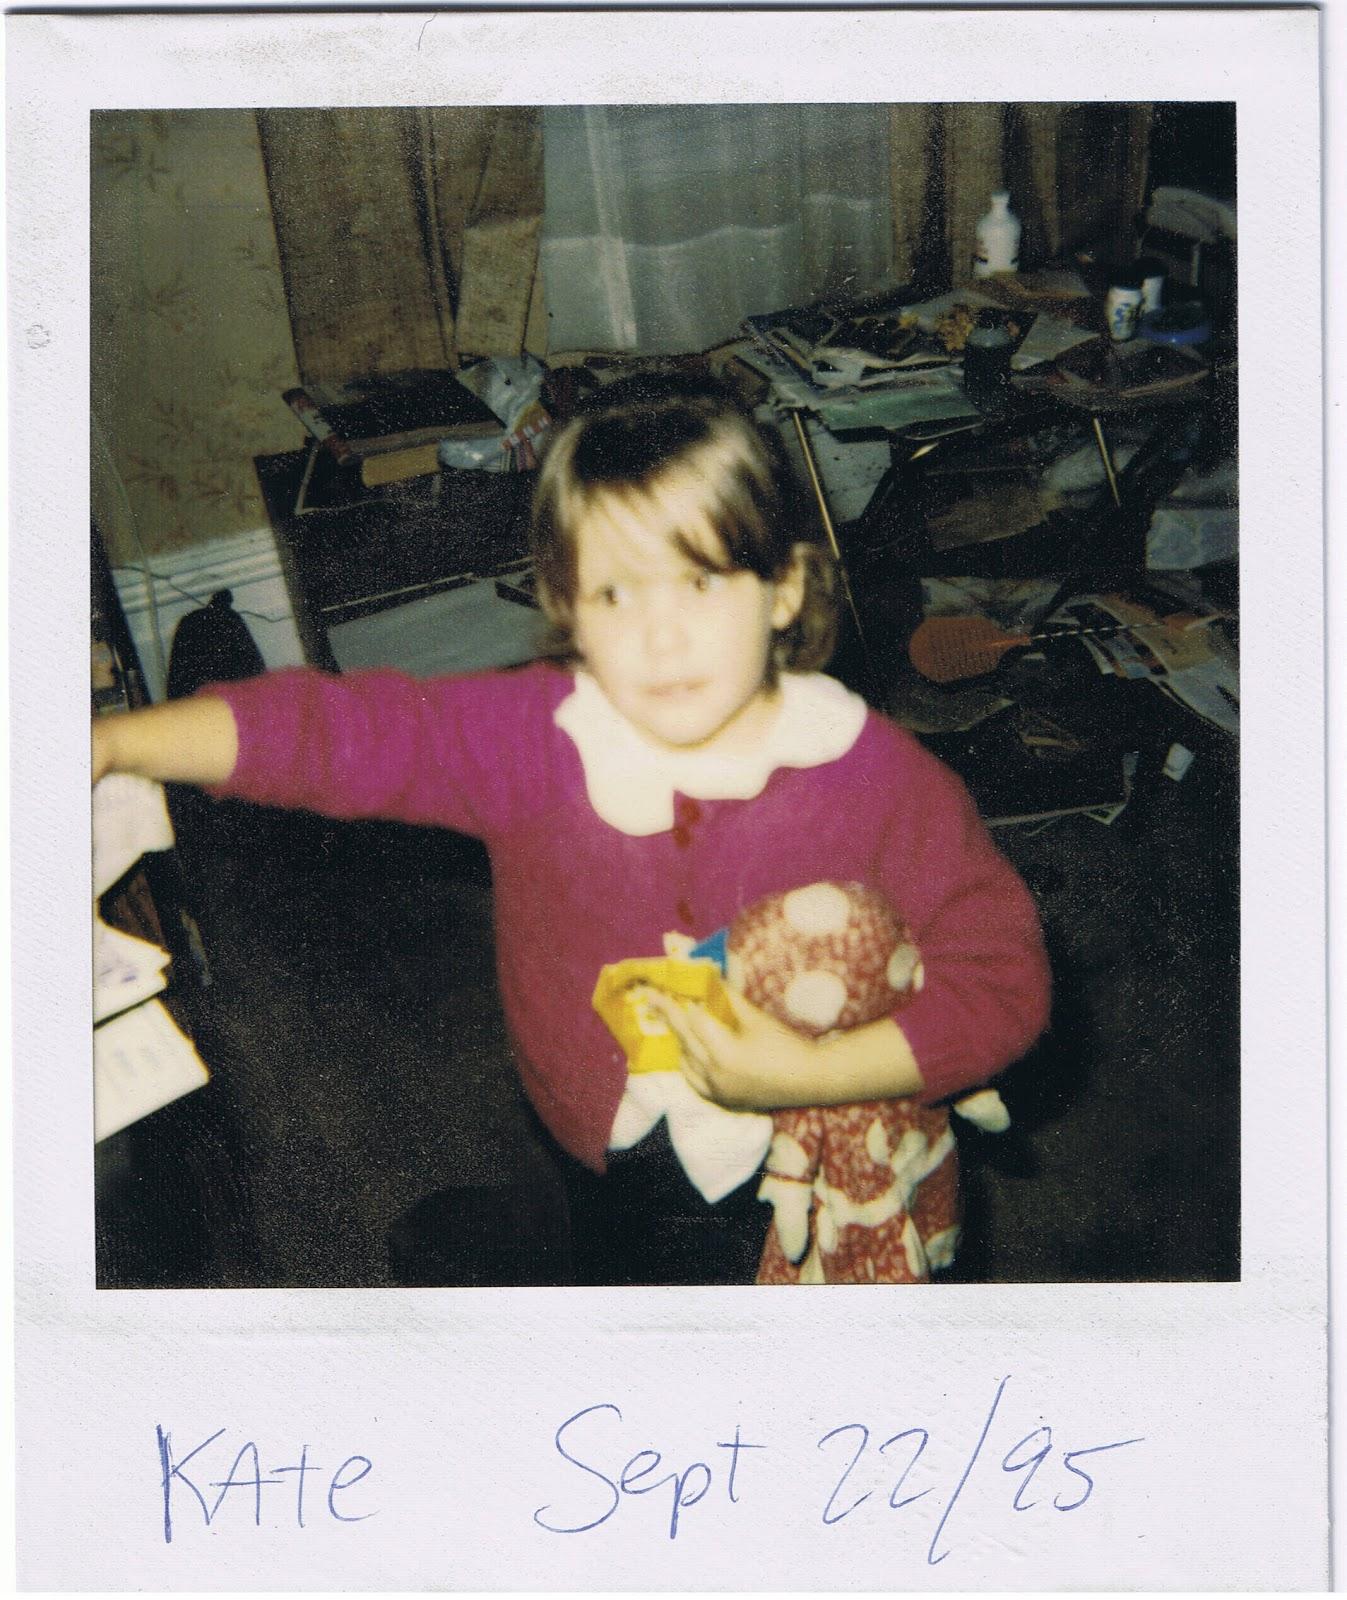 http://2.bp.blogspot.com/-MRAQN_pLNgU/UOS91T54X7I/AAAAAAAAH9s/rcSX__VYWHc/s1600/Kate+September+22+1995.jpg